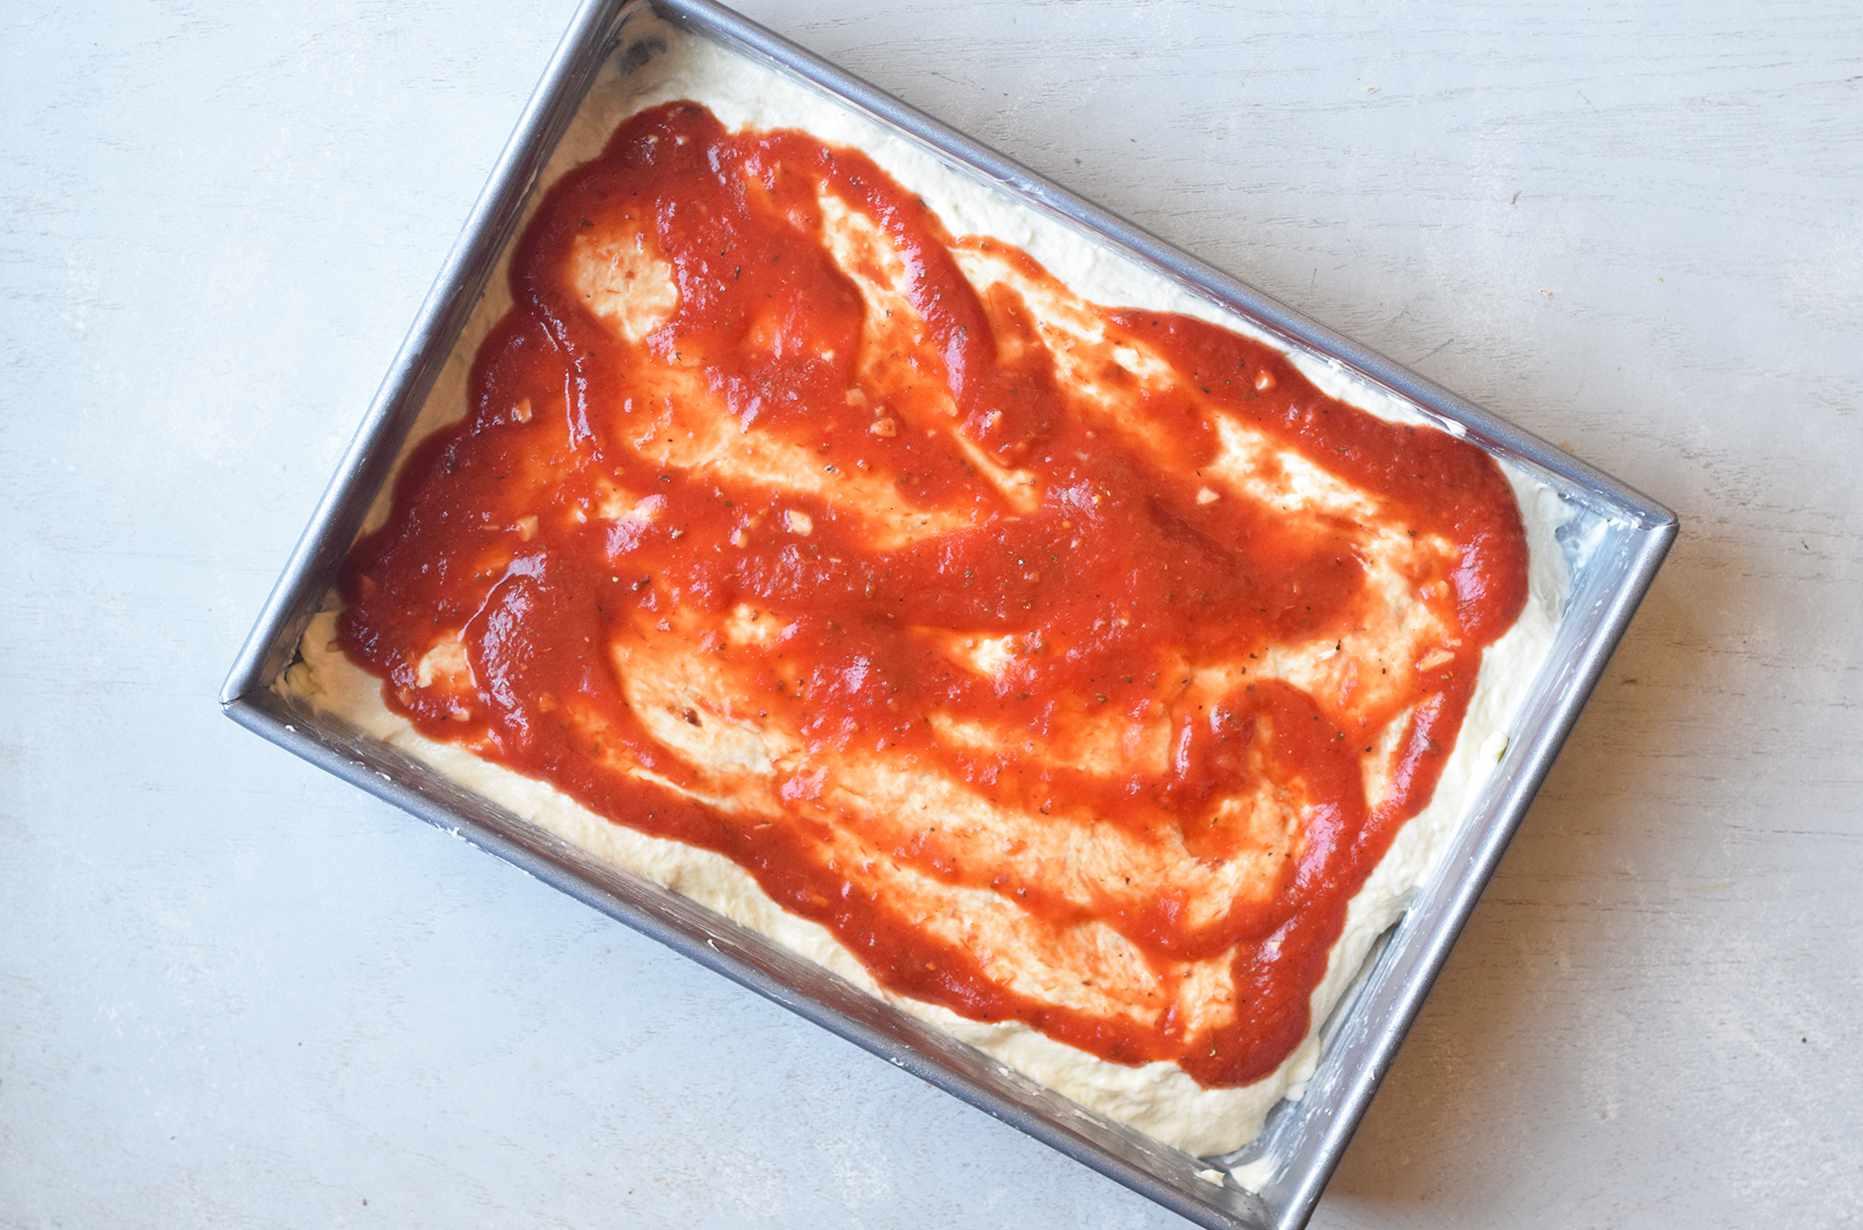 Pizza sauce on dough